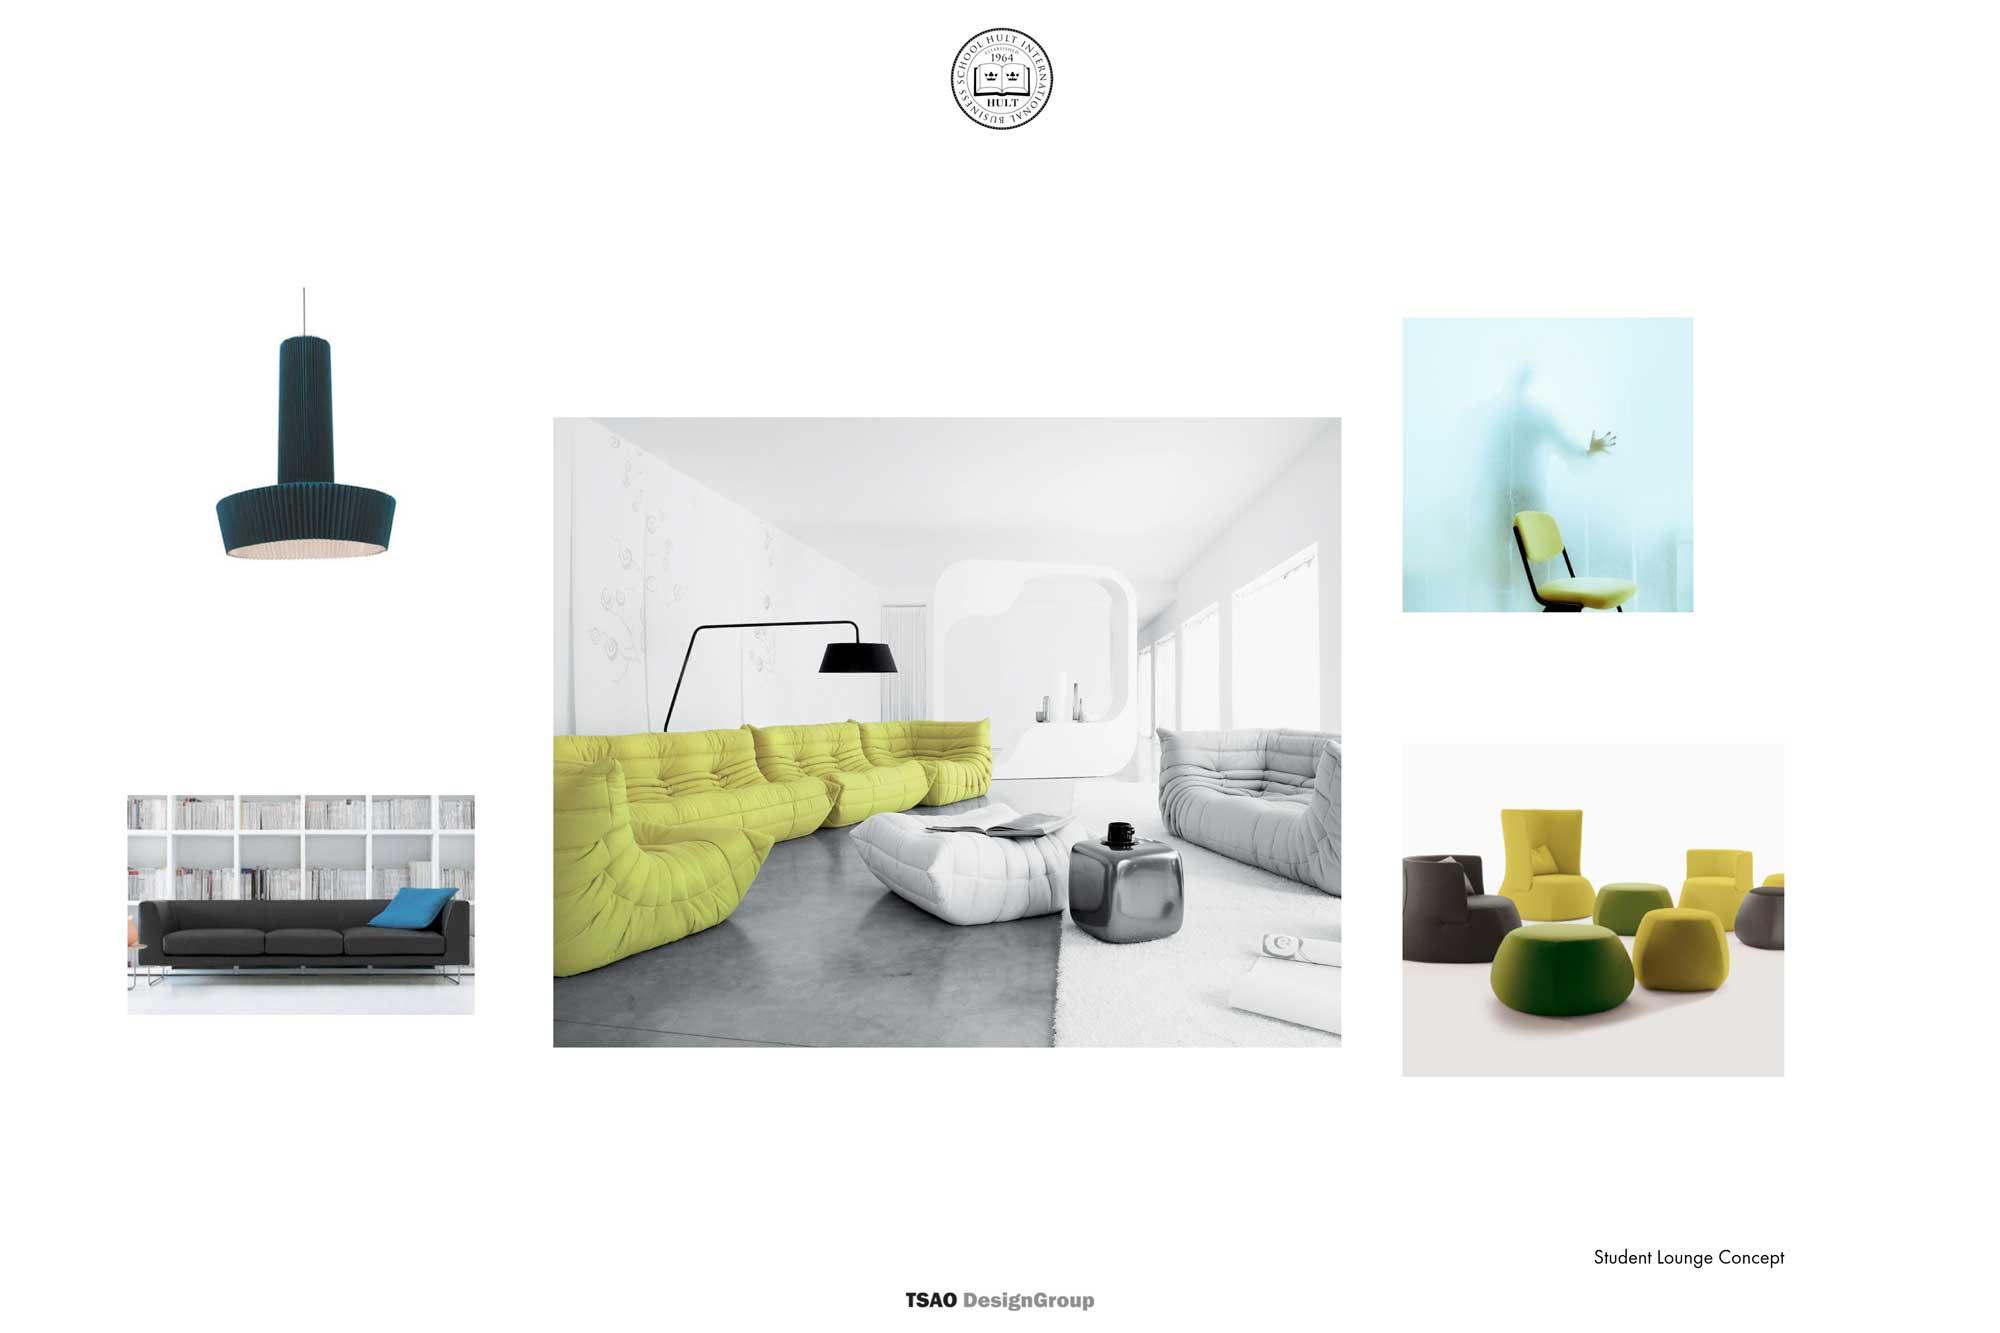 tsao-hult1355-concept-student_lounge-04.jpg